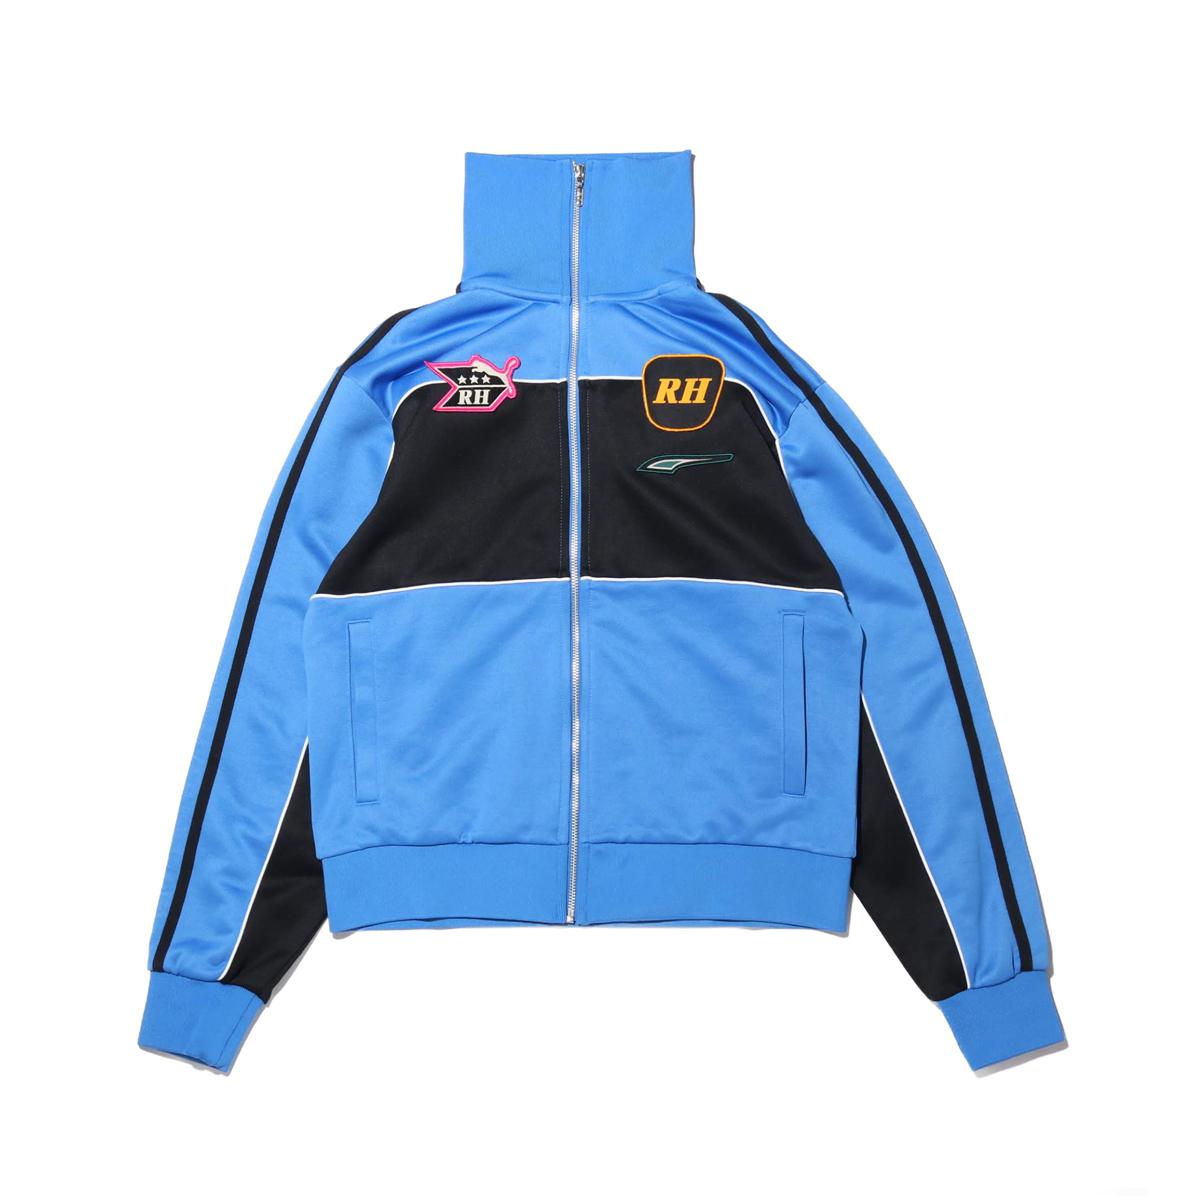 PUMA x RHUDE Track Jacket(PALACE BLUE)(プーマ X ルードトラックジャケット)【メンズ】【ジャケット】【20SP-S】